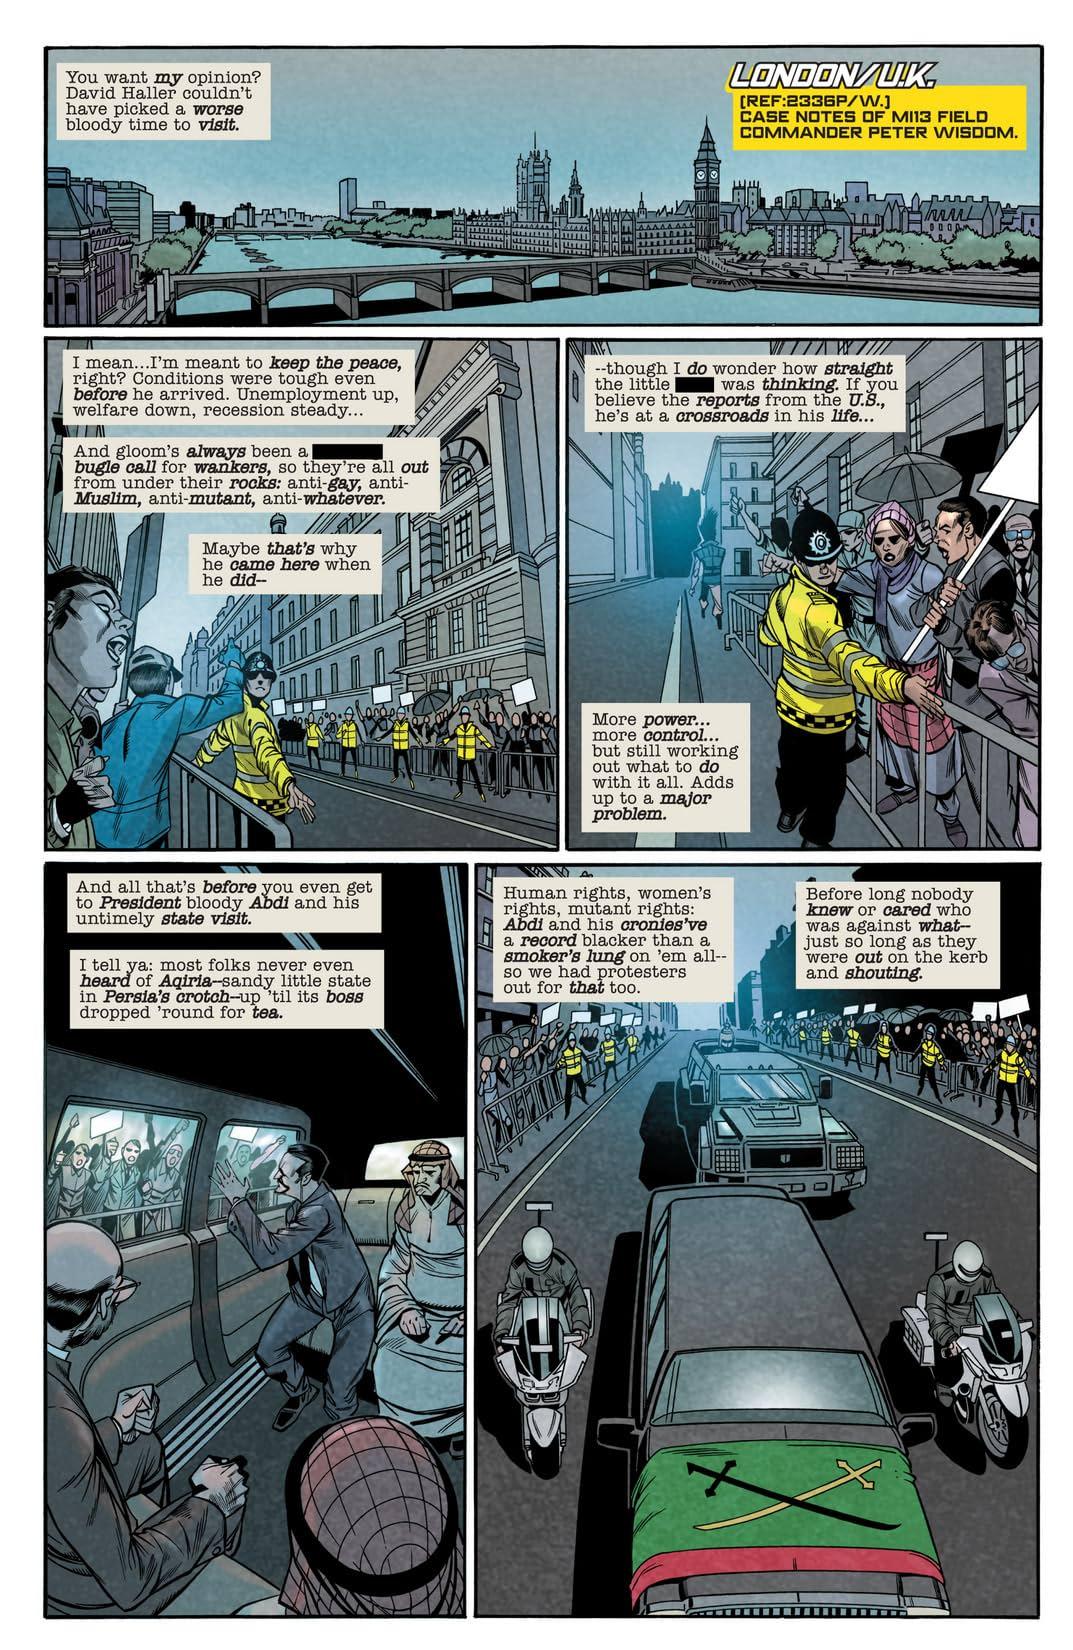 X-Men Legacy: Legion Vol. 3: Revenants